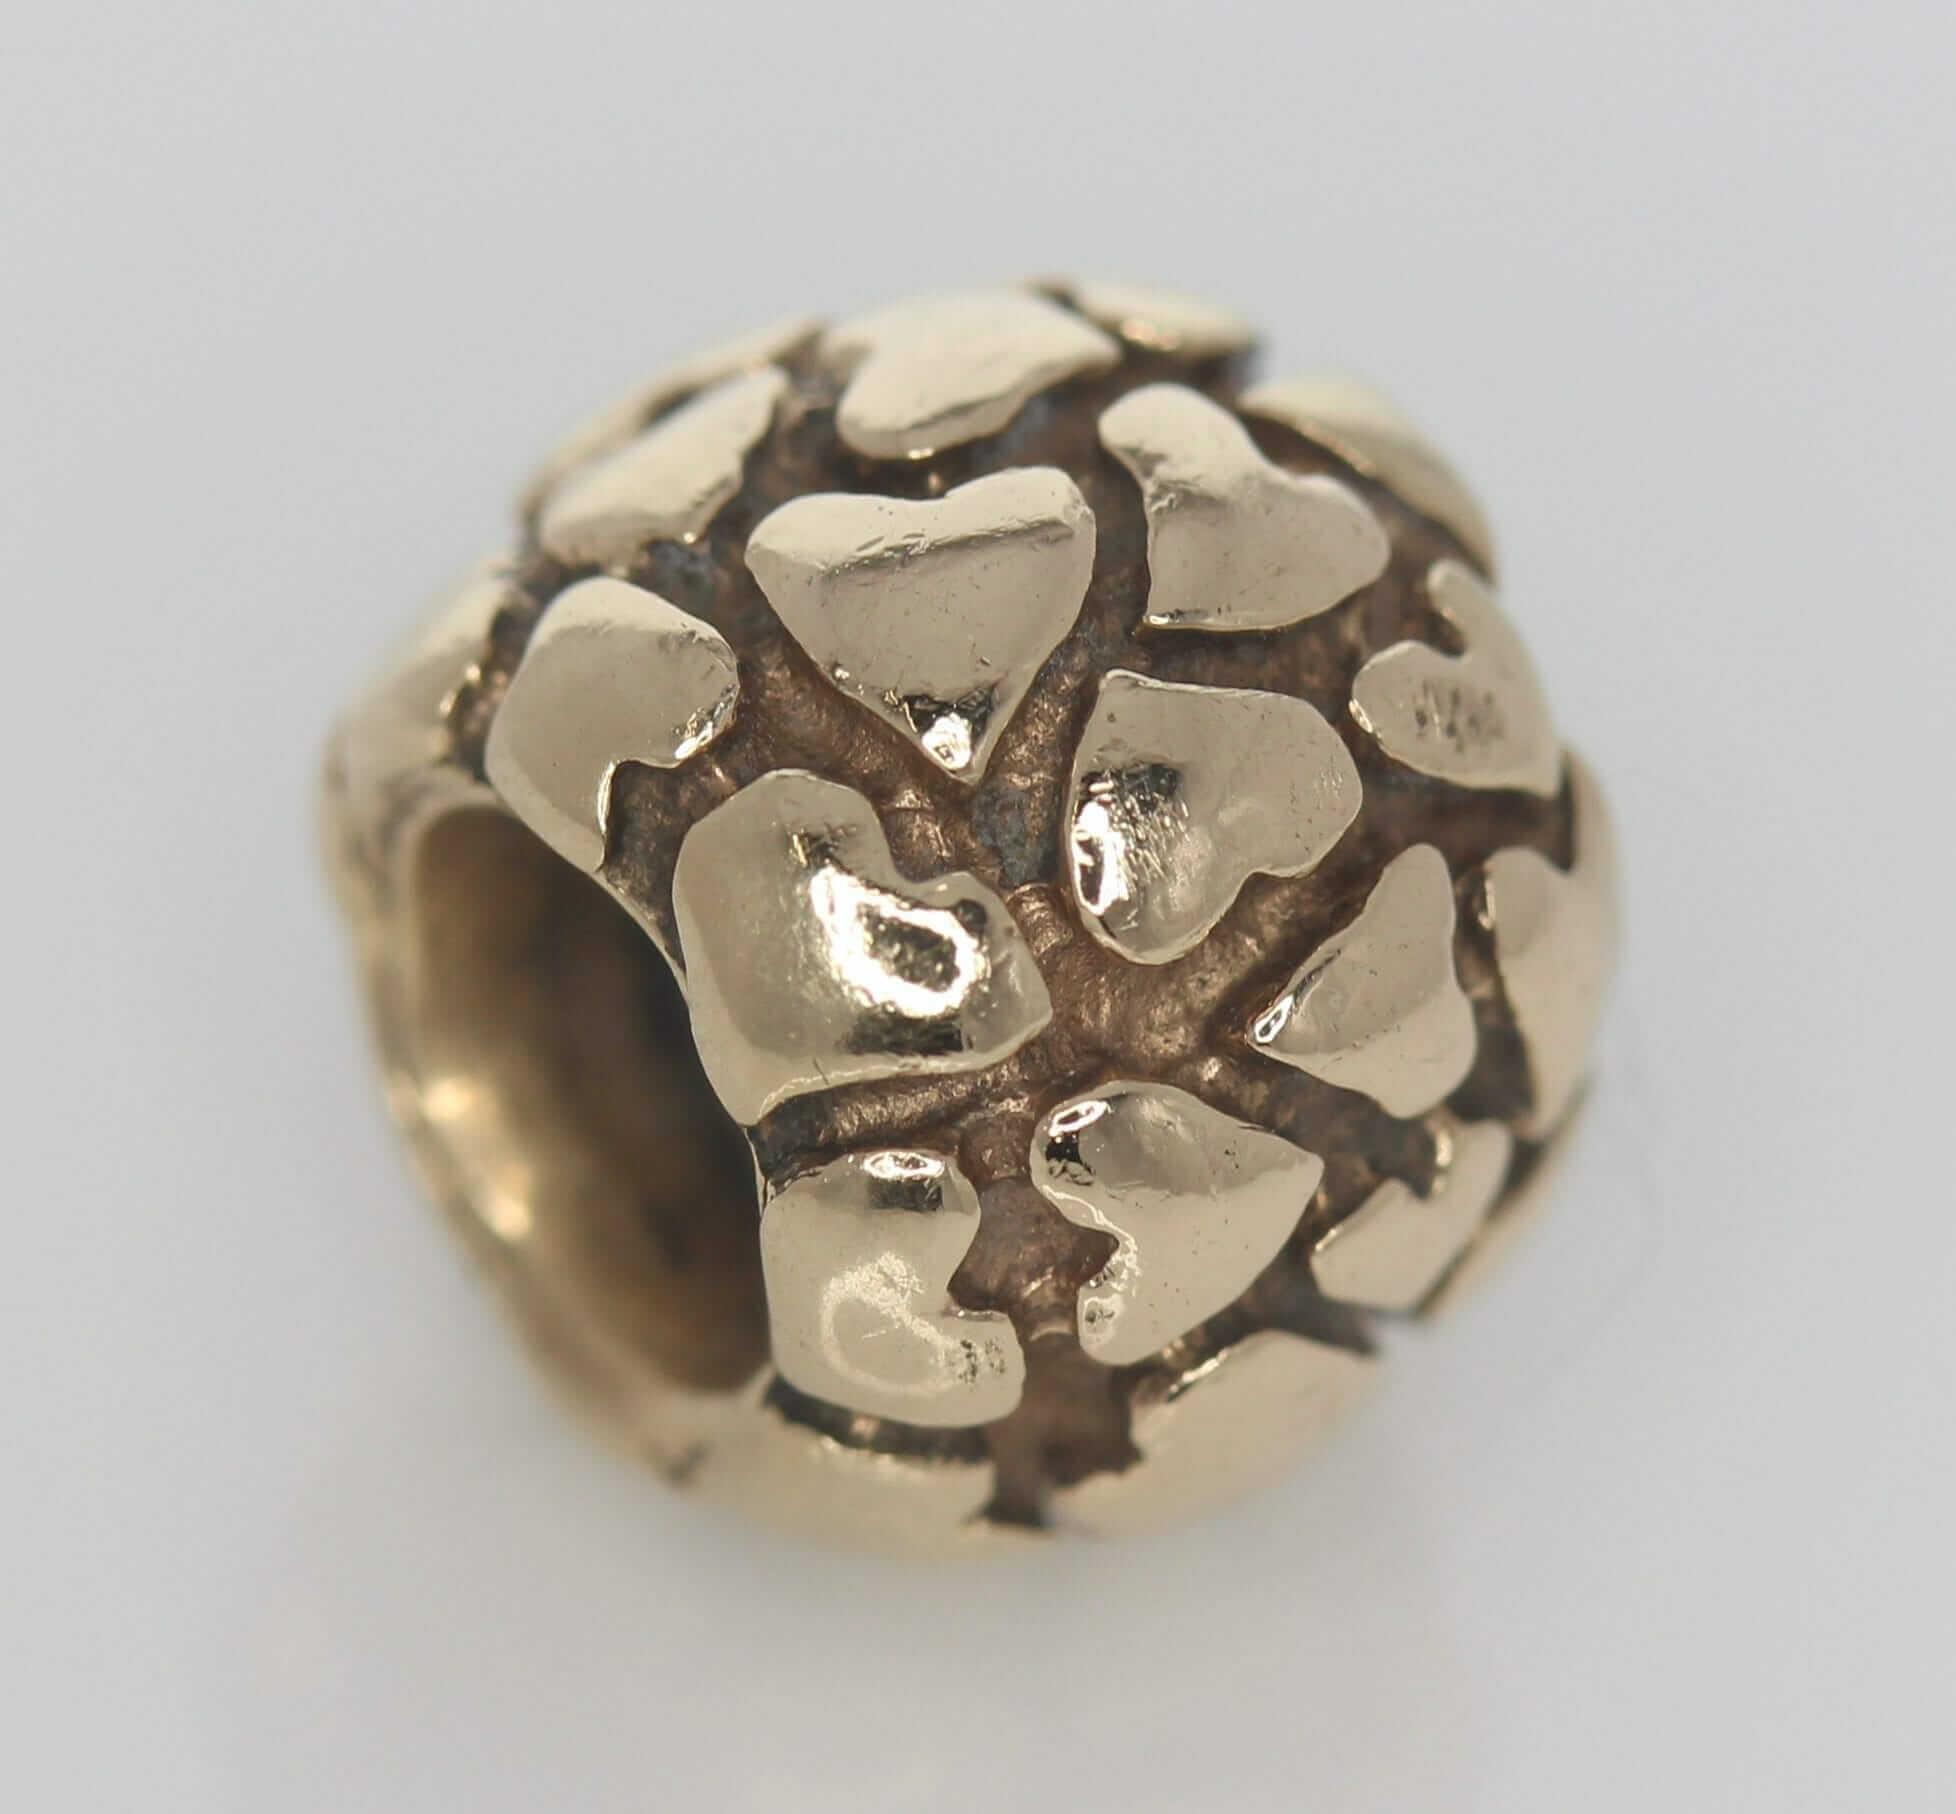 Pandora 14ct Gold Lotsa Love Hearts Charm - 750236 - Retired ALE 585 1